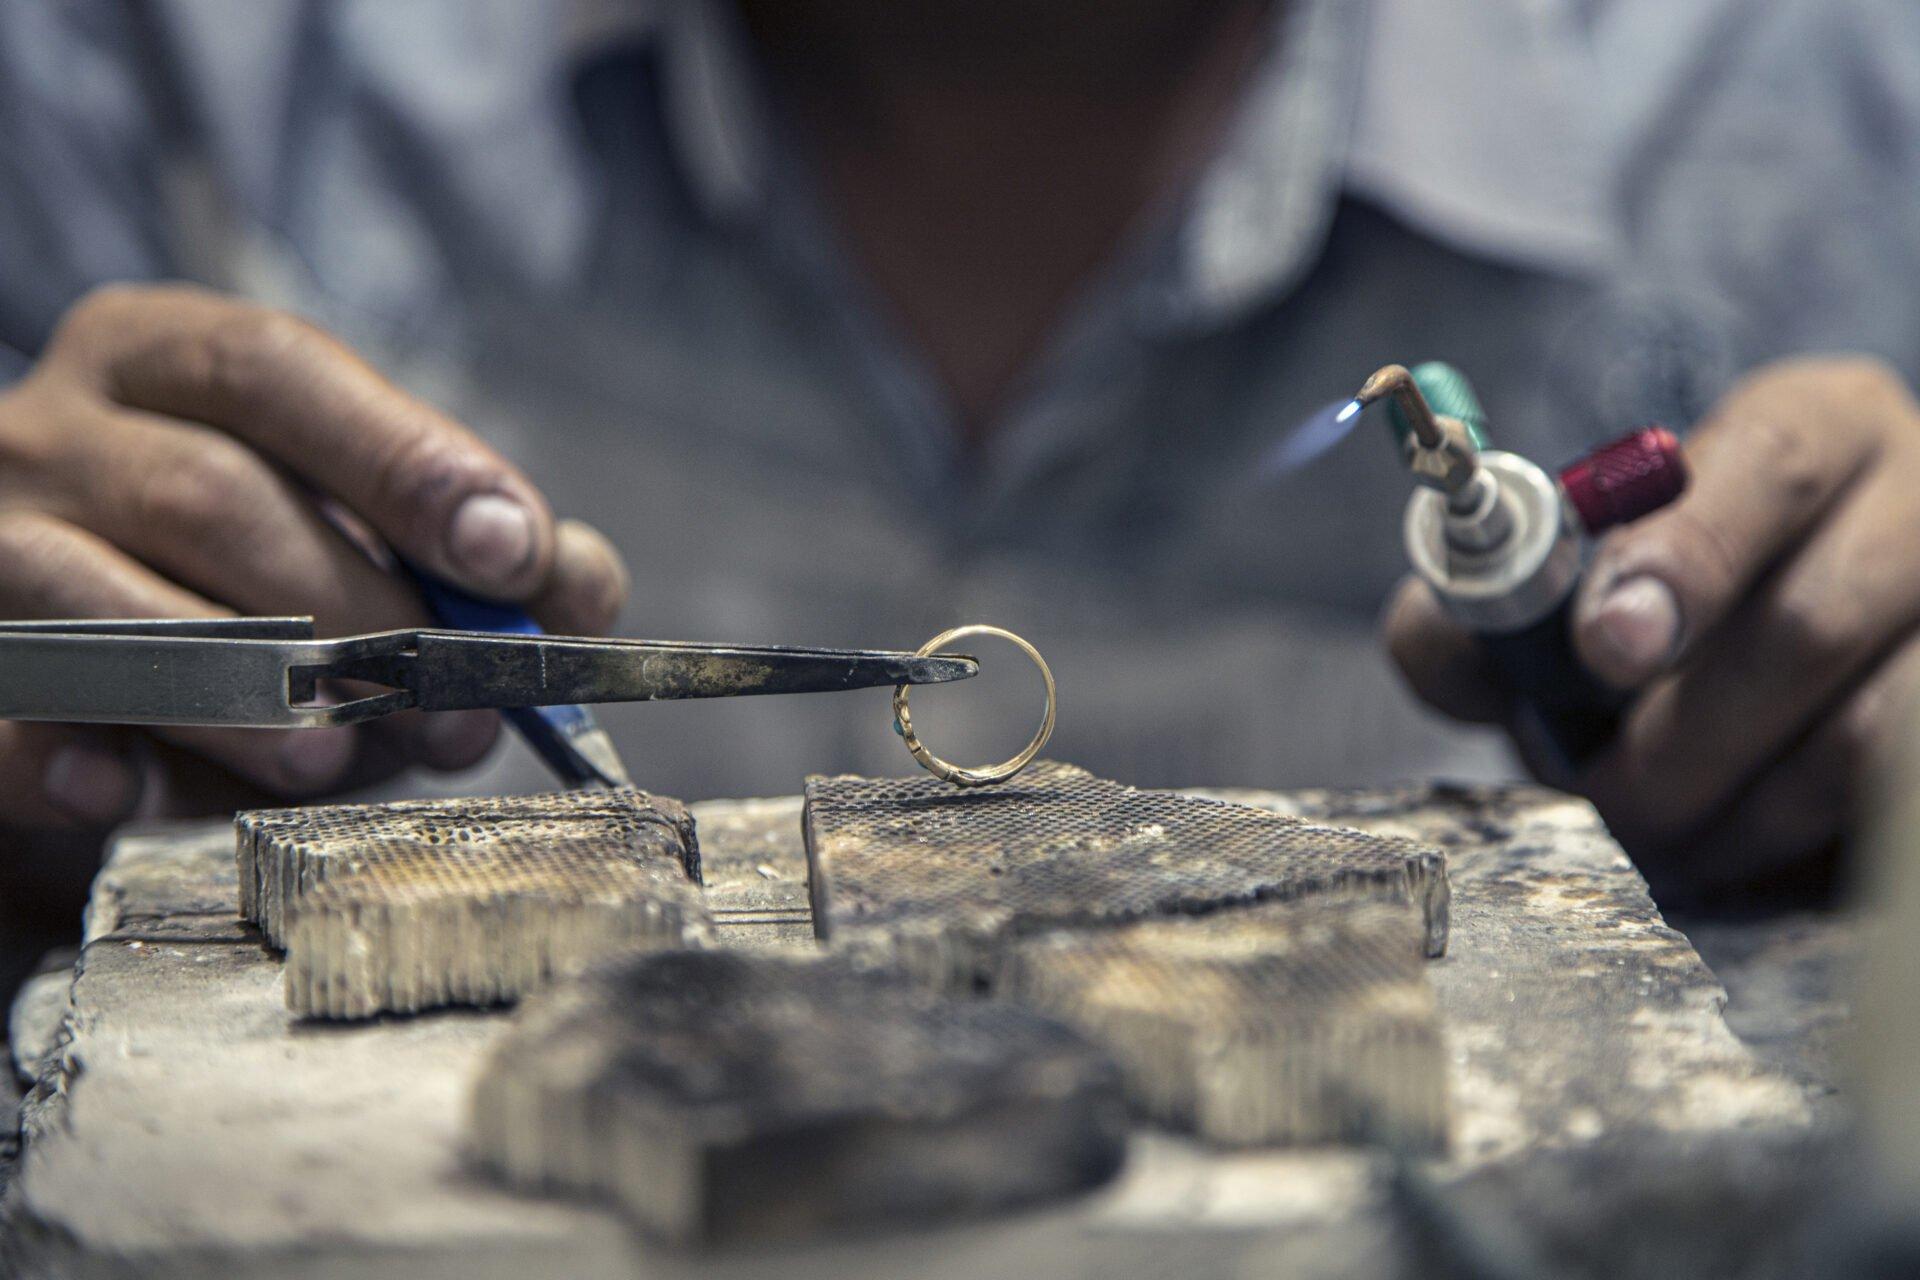 Eternity Jewellery goldsmith on work